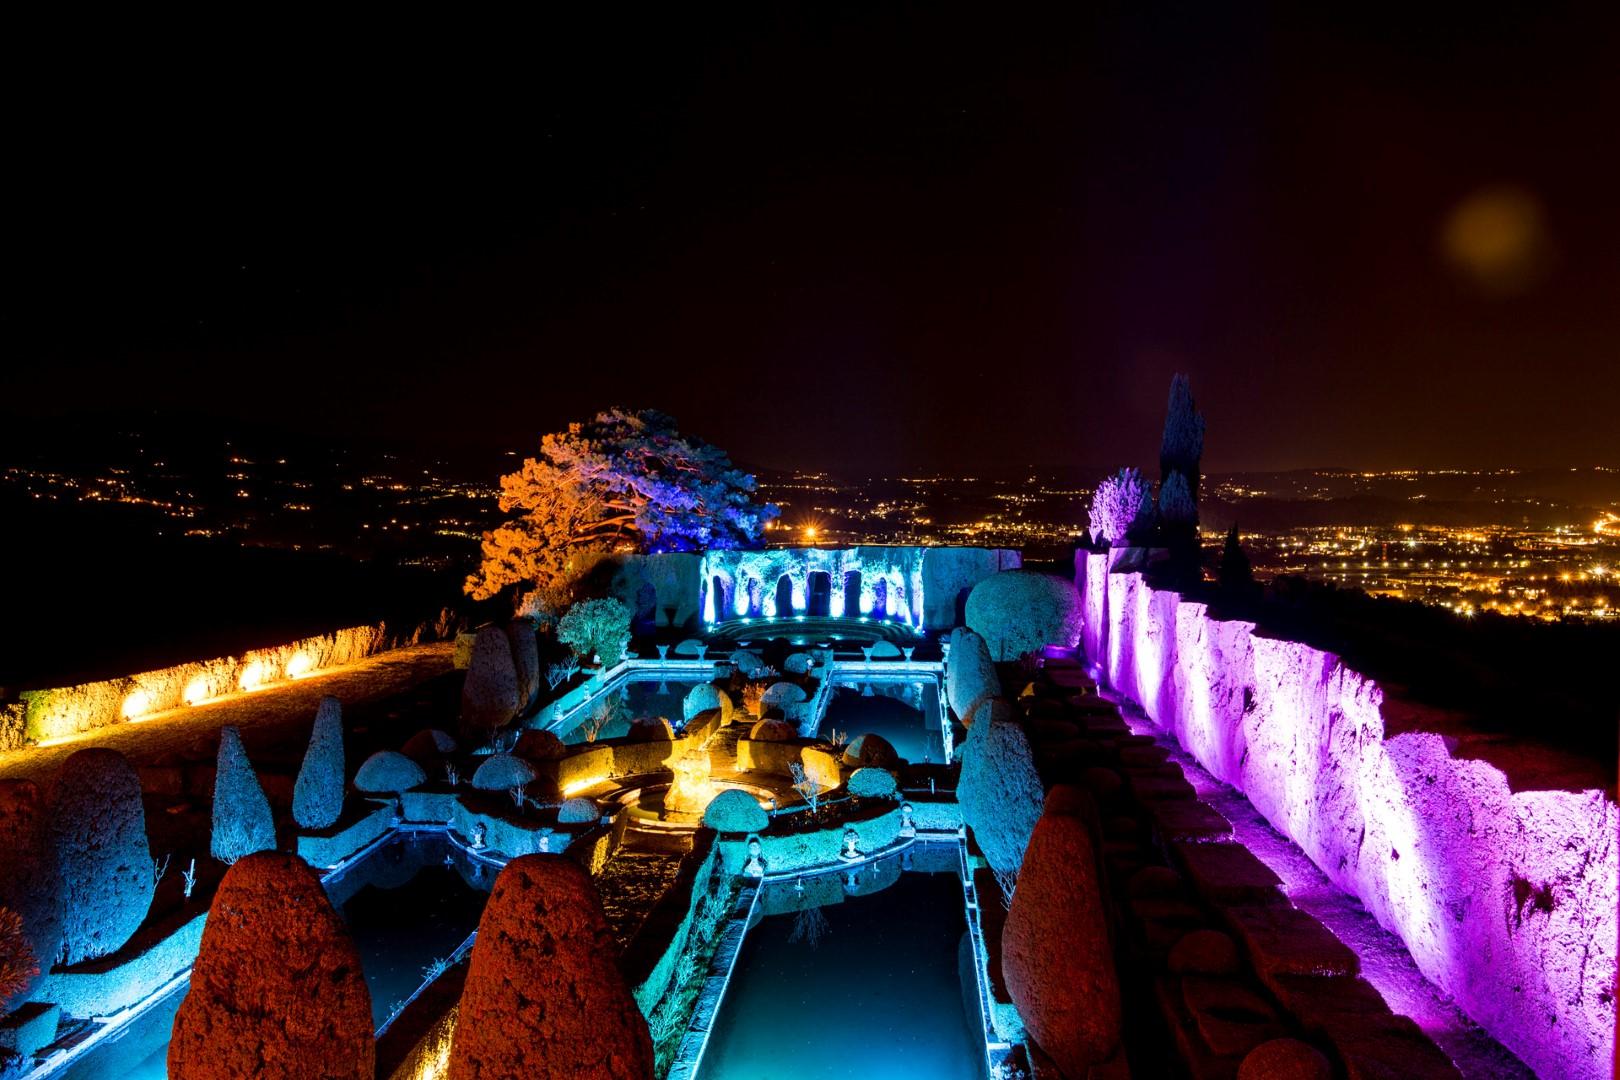 Borgo di Pignano - fairy lights